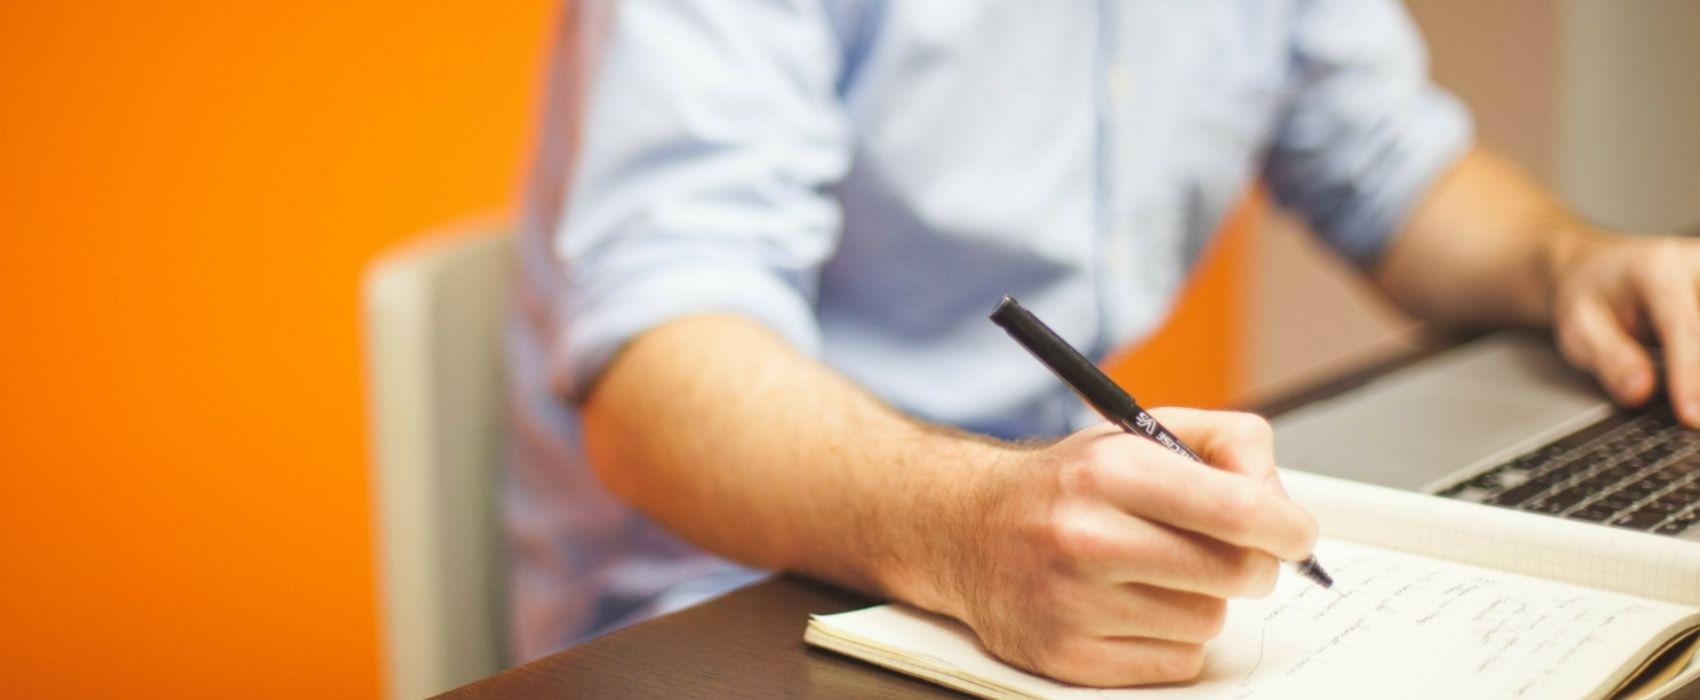 Let's learn how to write a job-winning resume for freelance translator in 10 easy steps